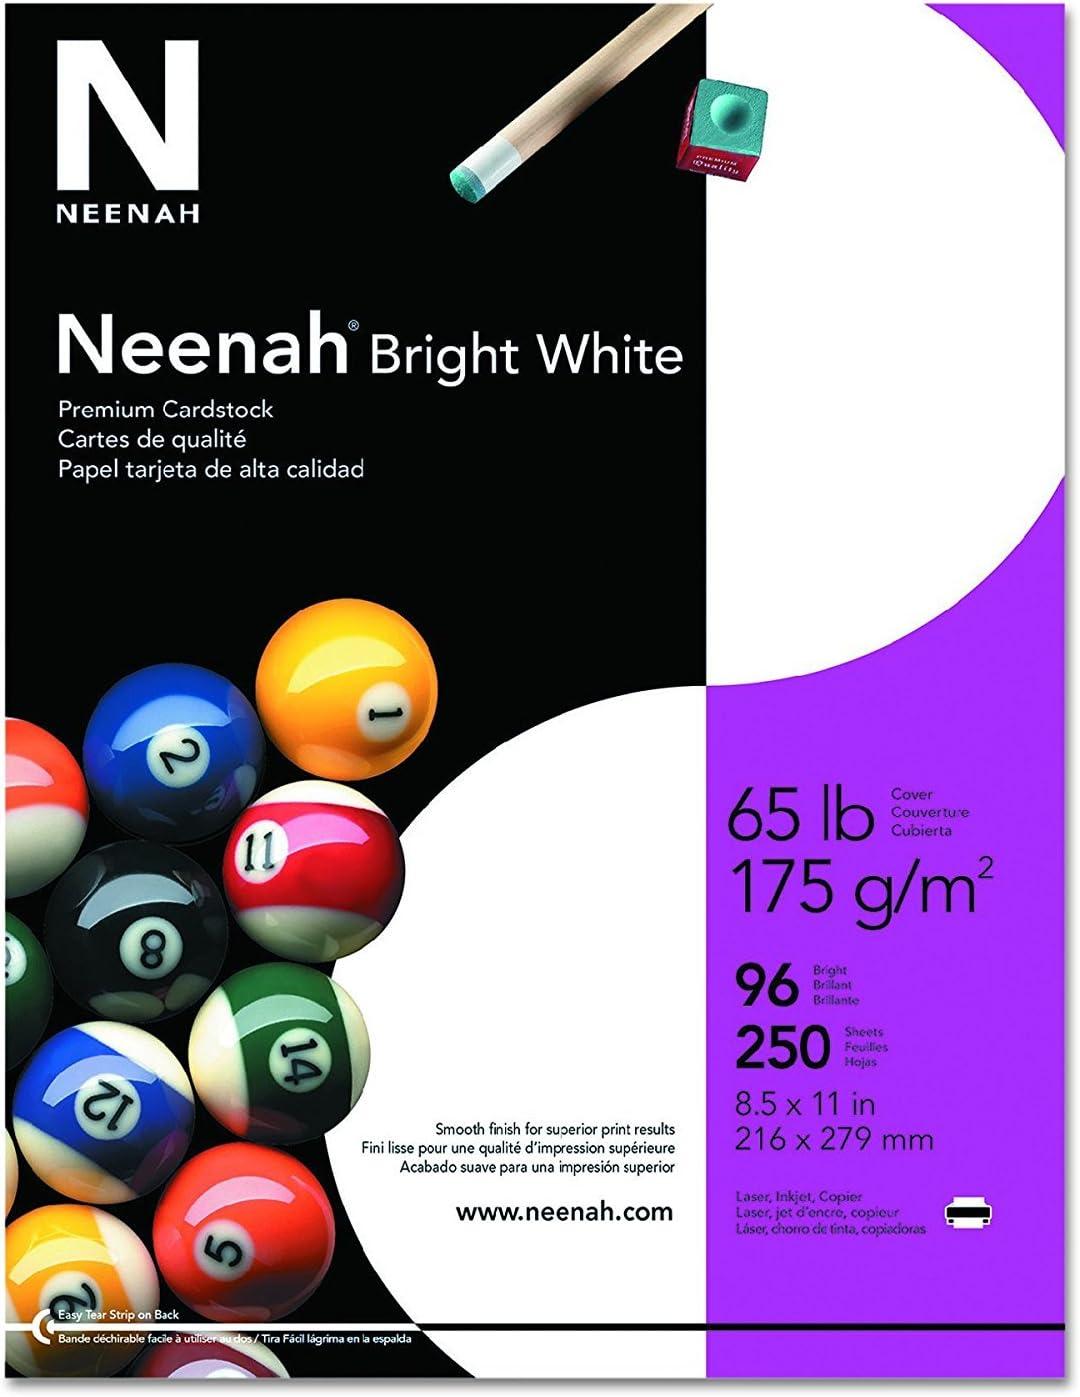 Neenah Bright White Cardstock, 8.5